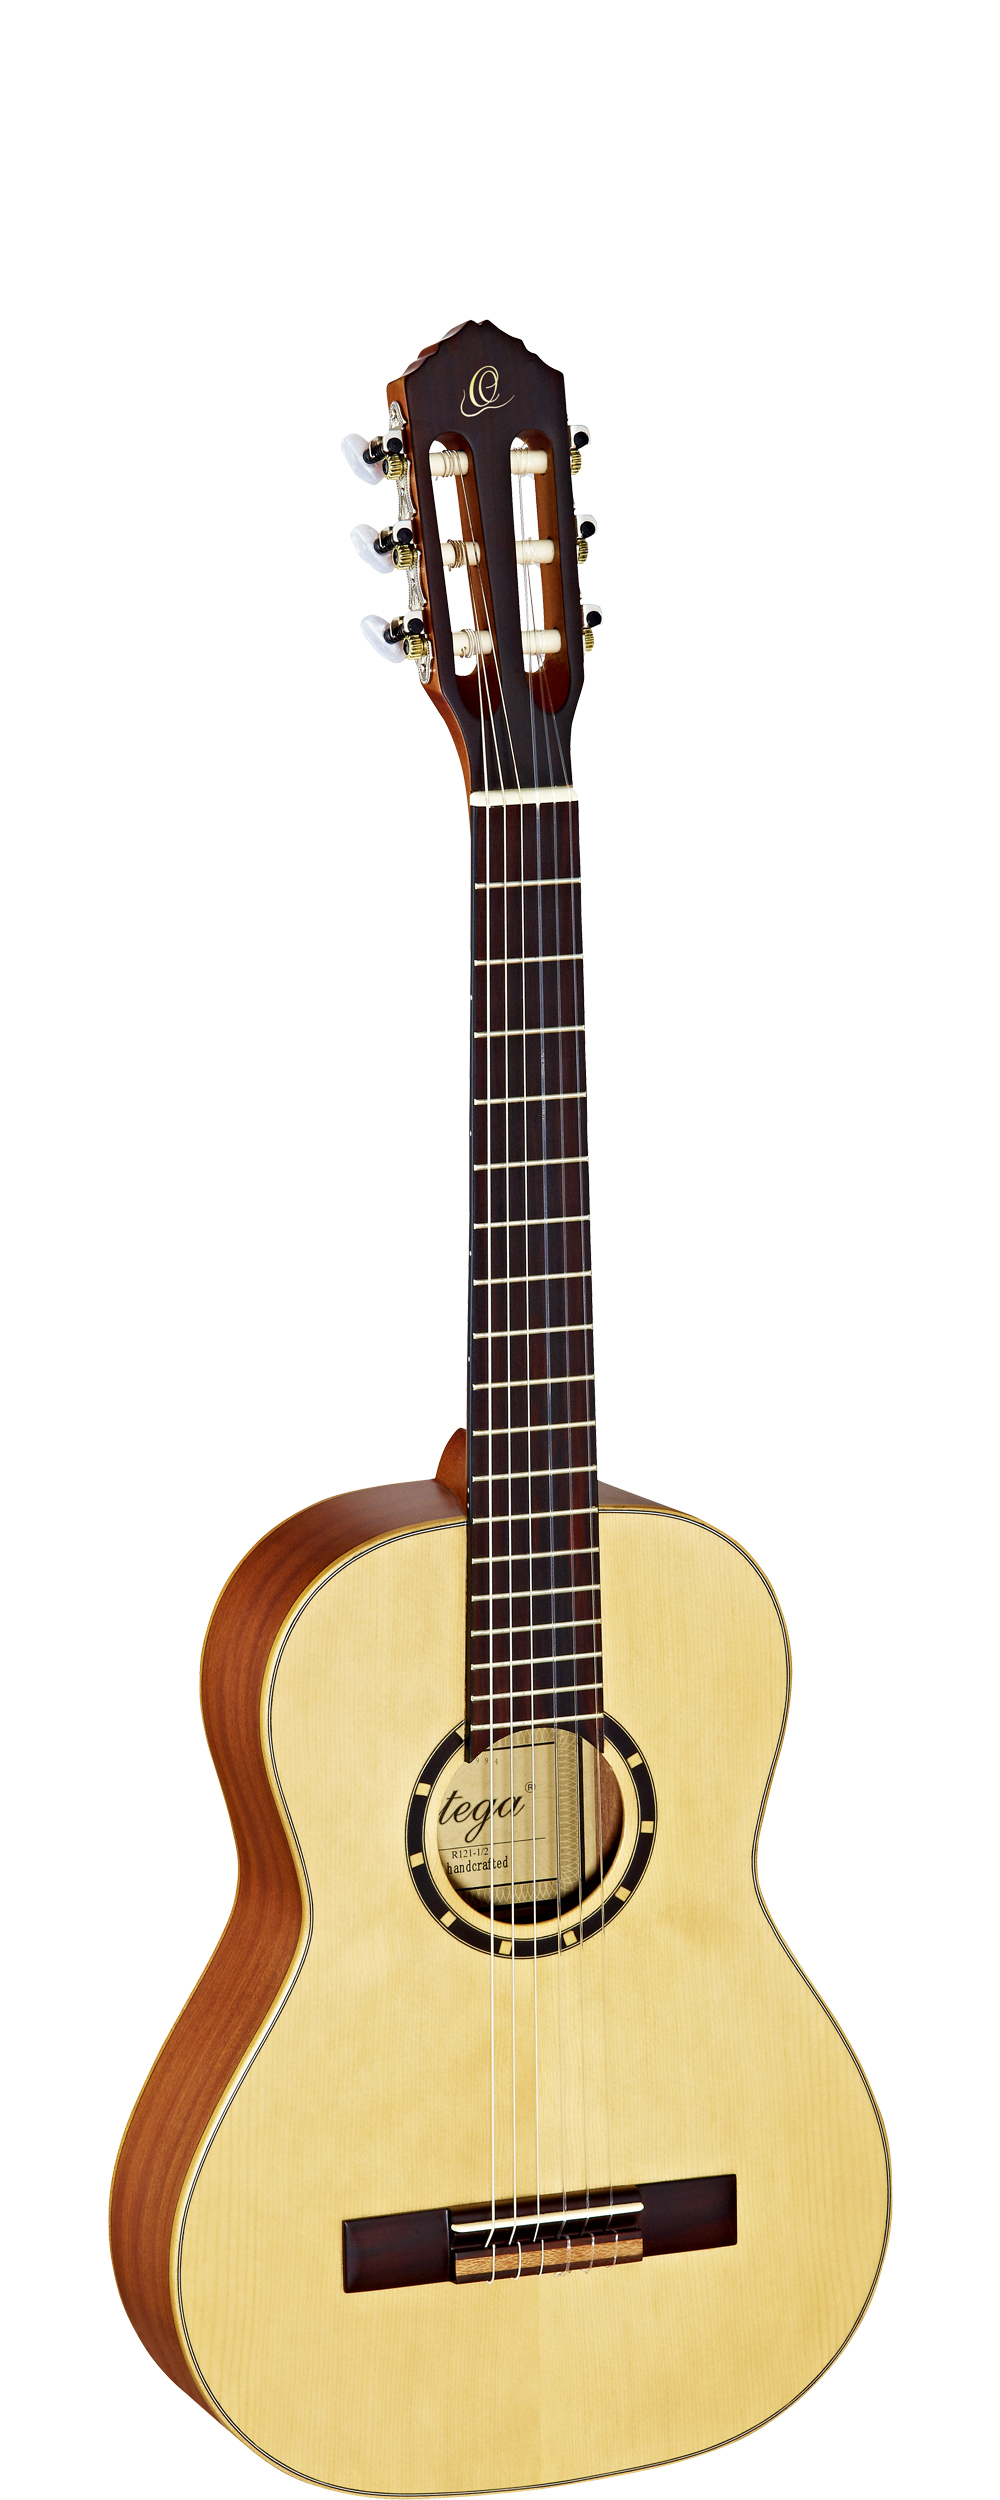 Ortega R 121 1/2 Konzertgitarre